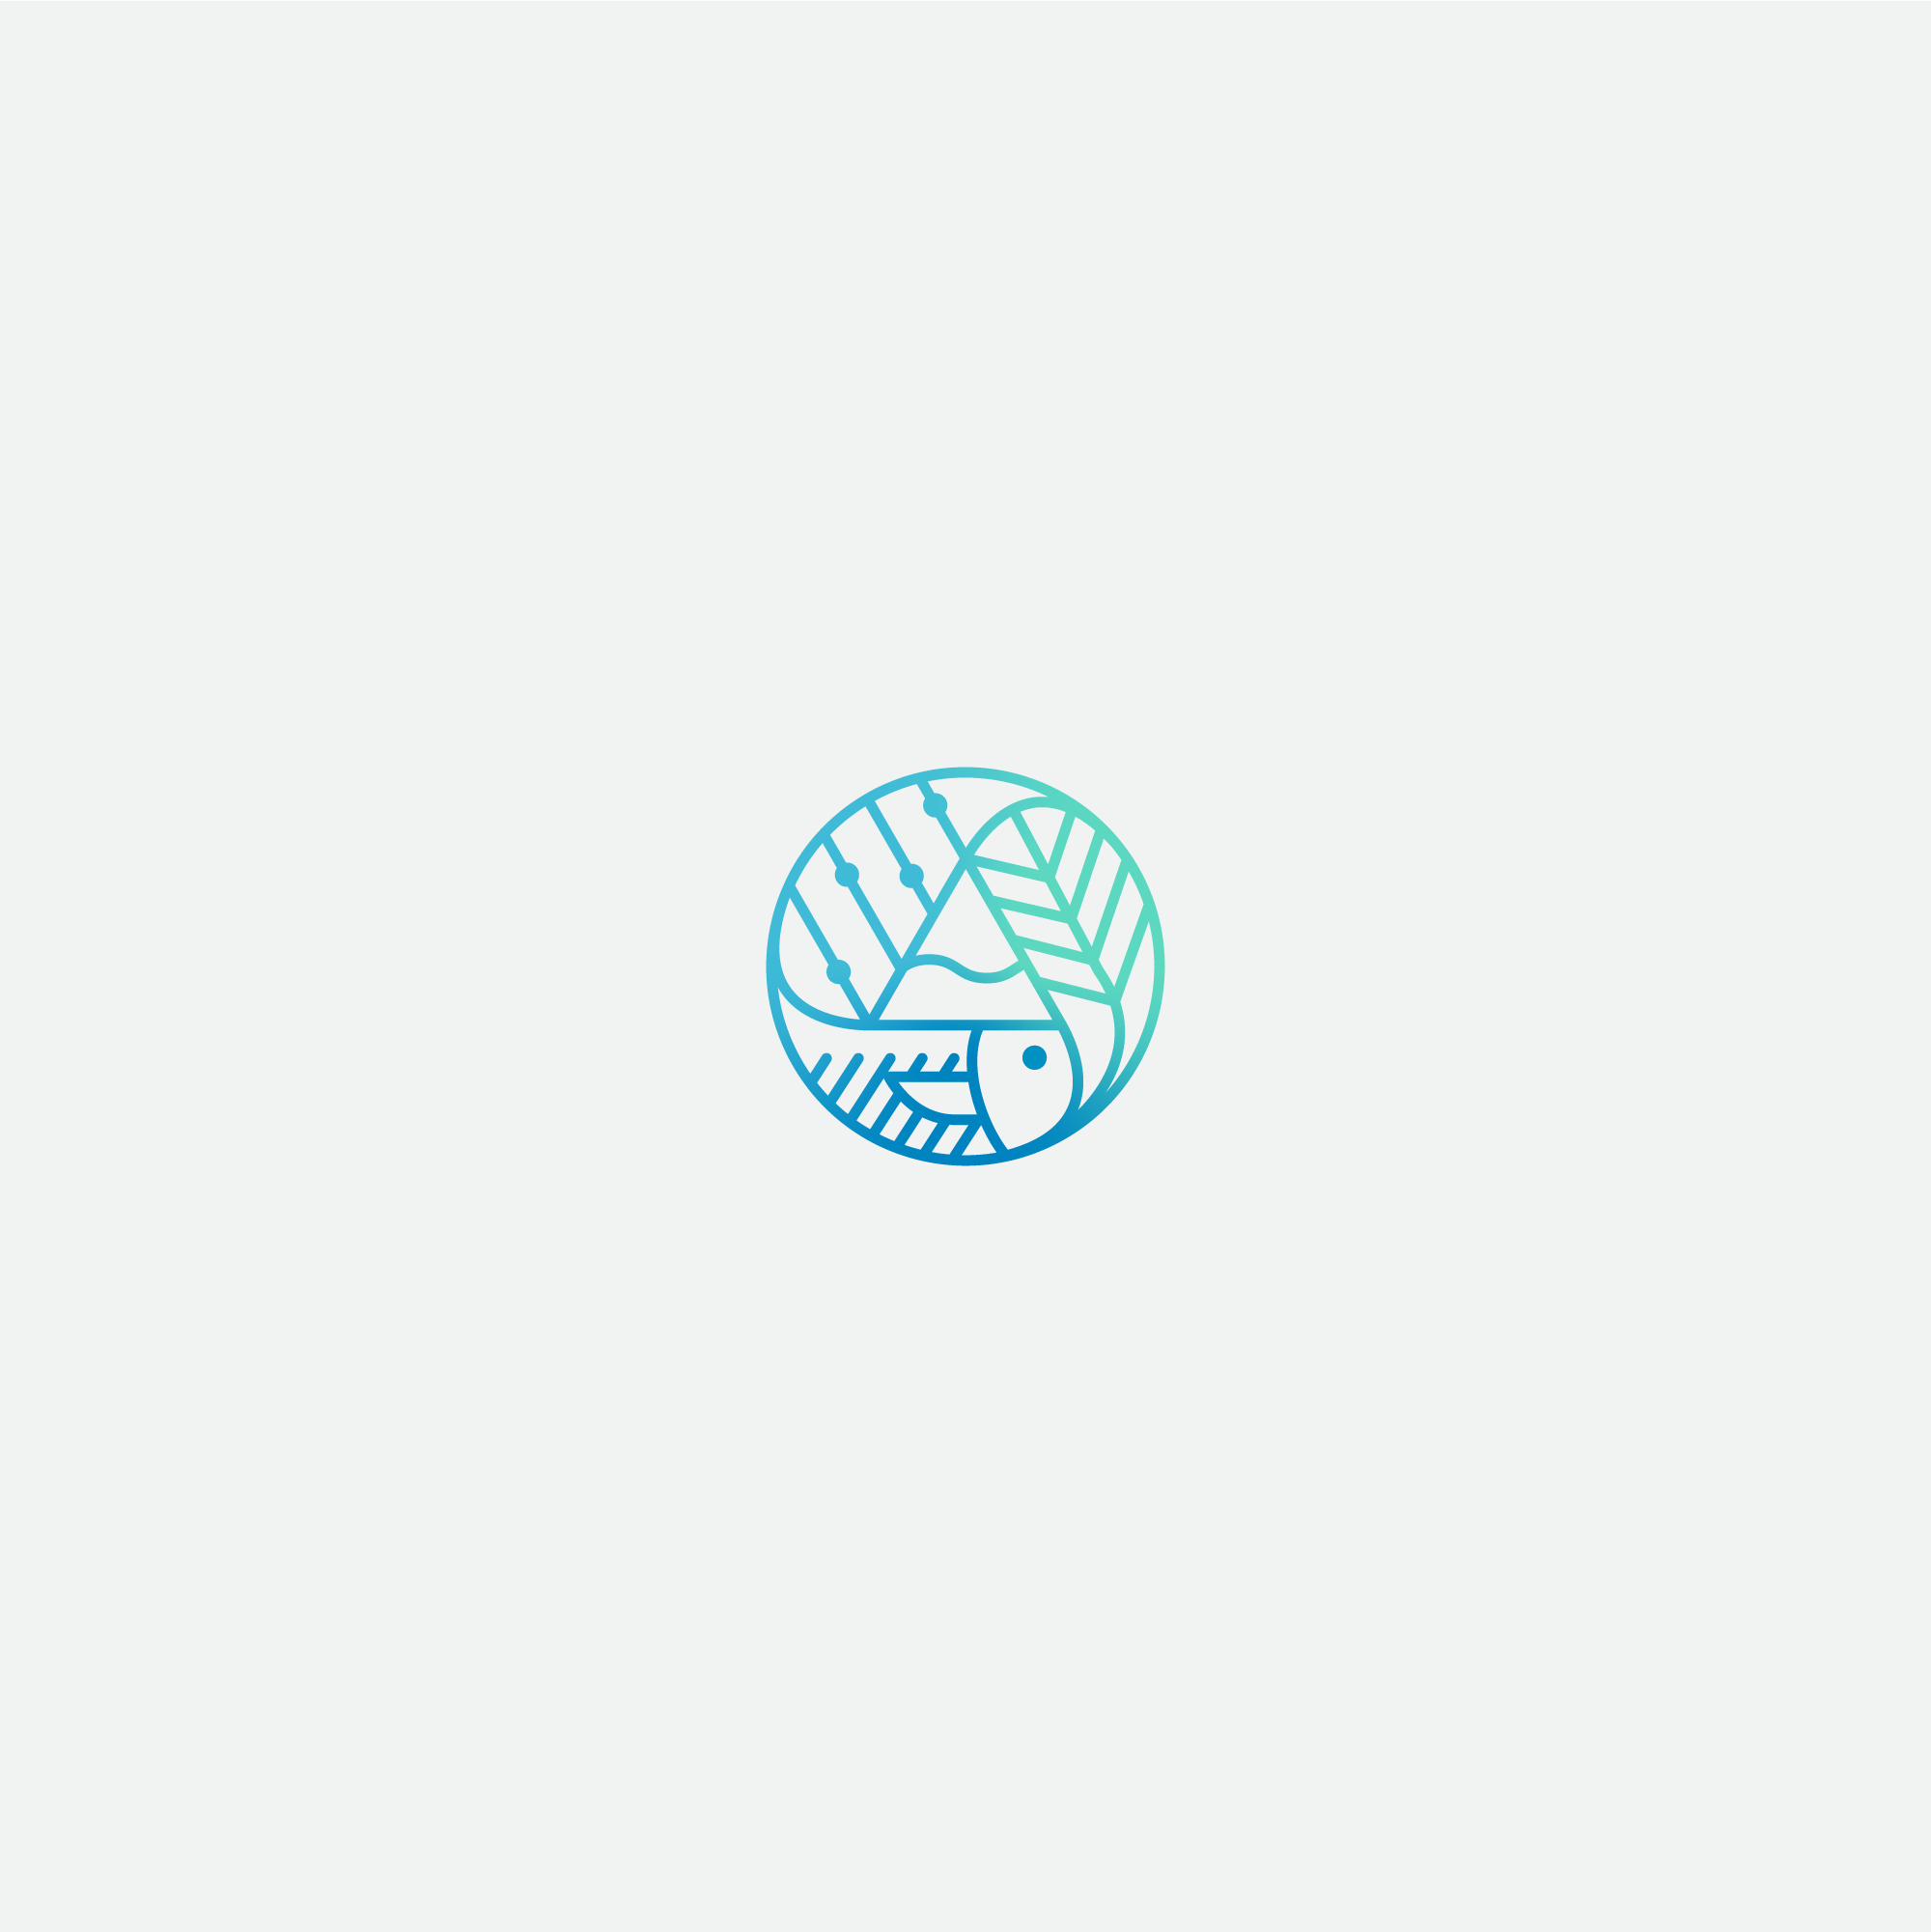 auto-organics-logo-brand-identity-01.png